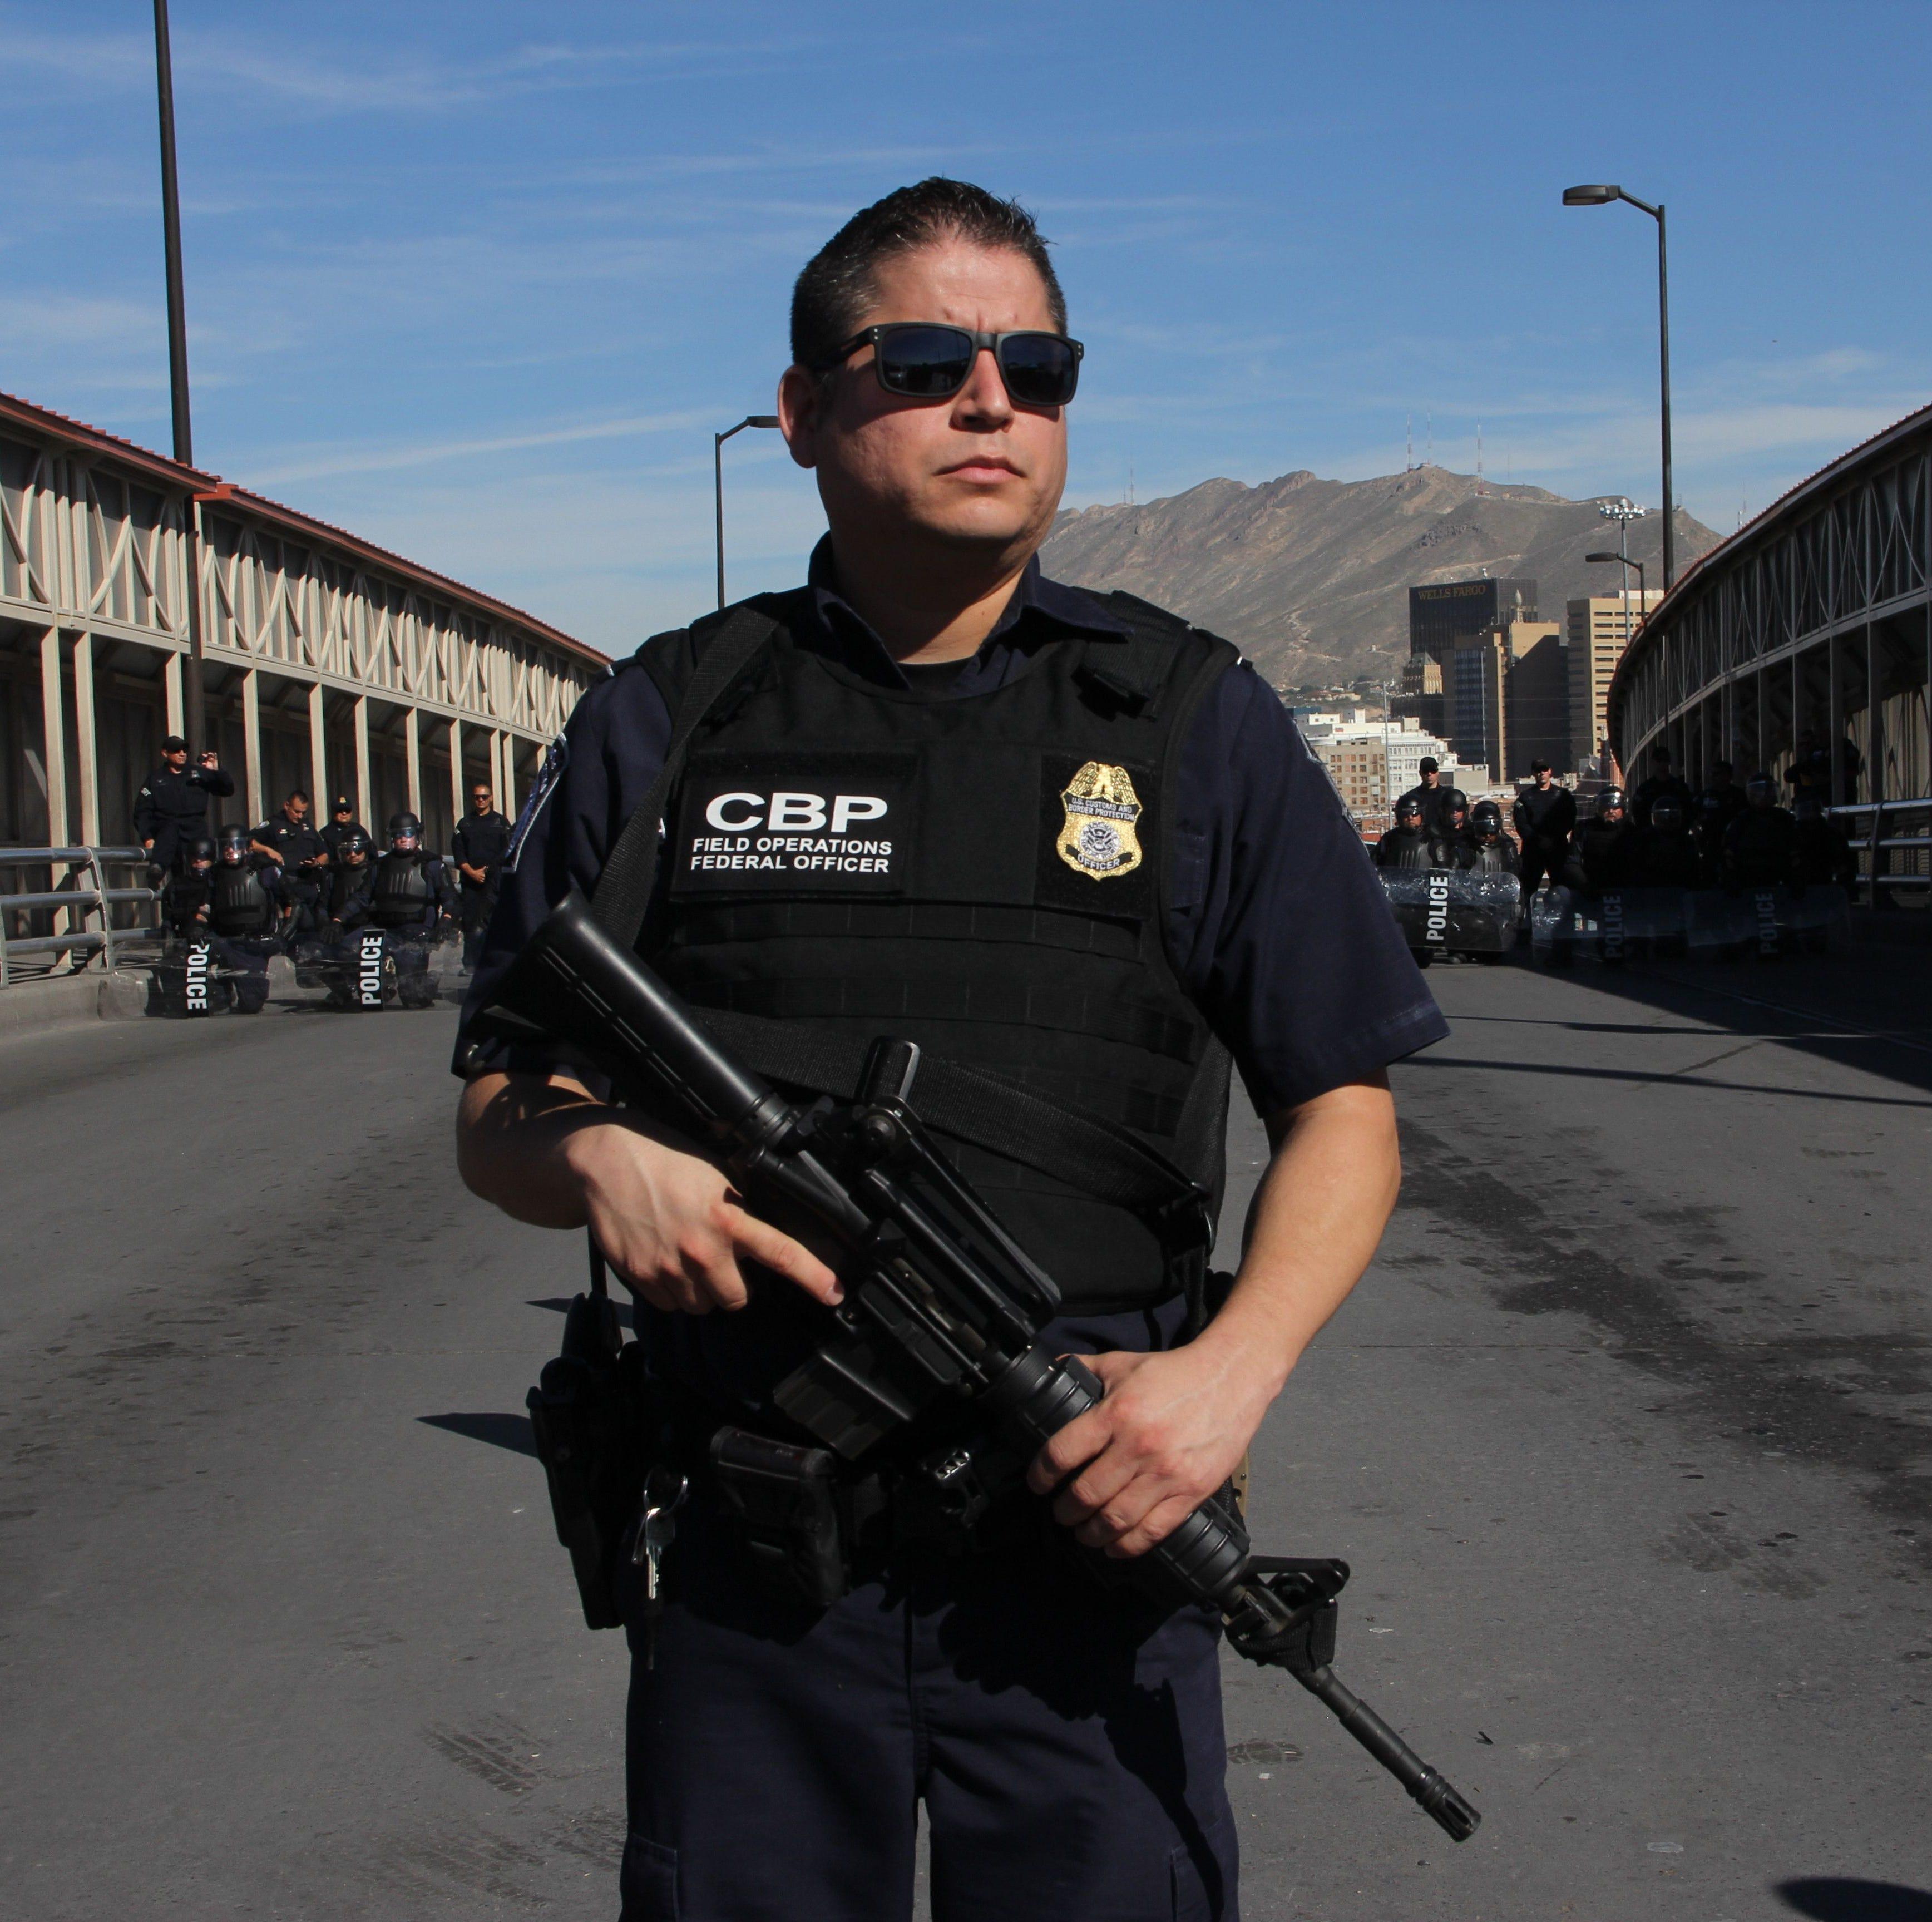 EEUU refuerza frontera con Tijuana ante avance de caravana